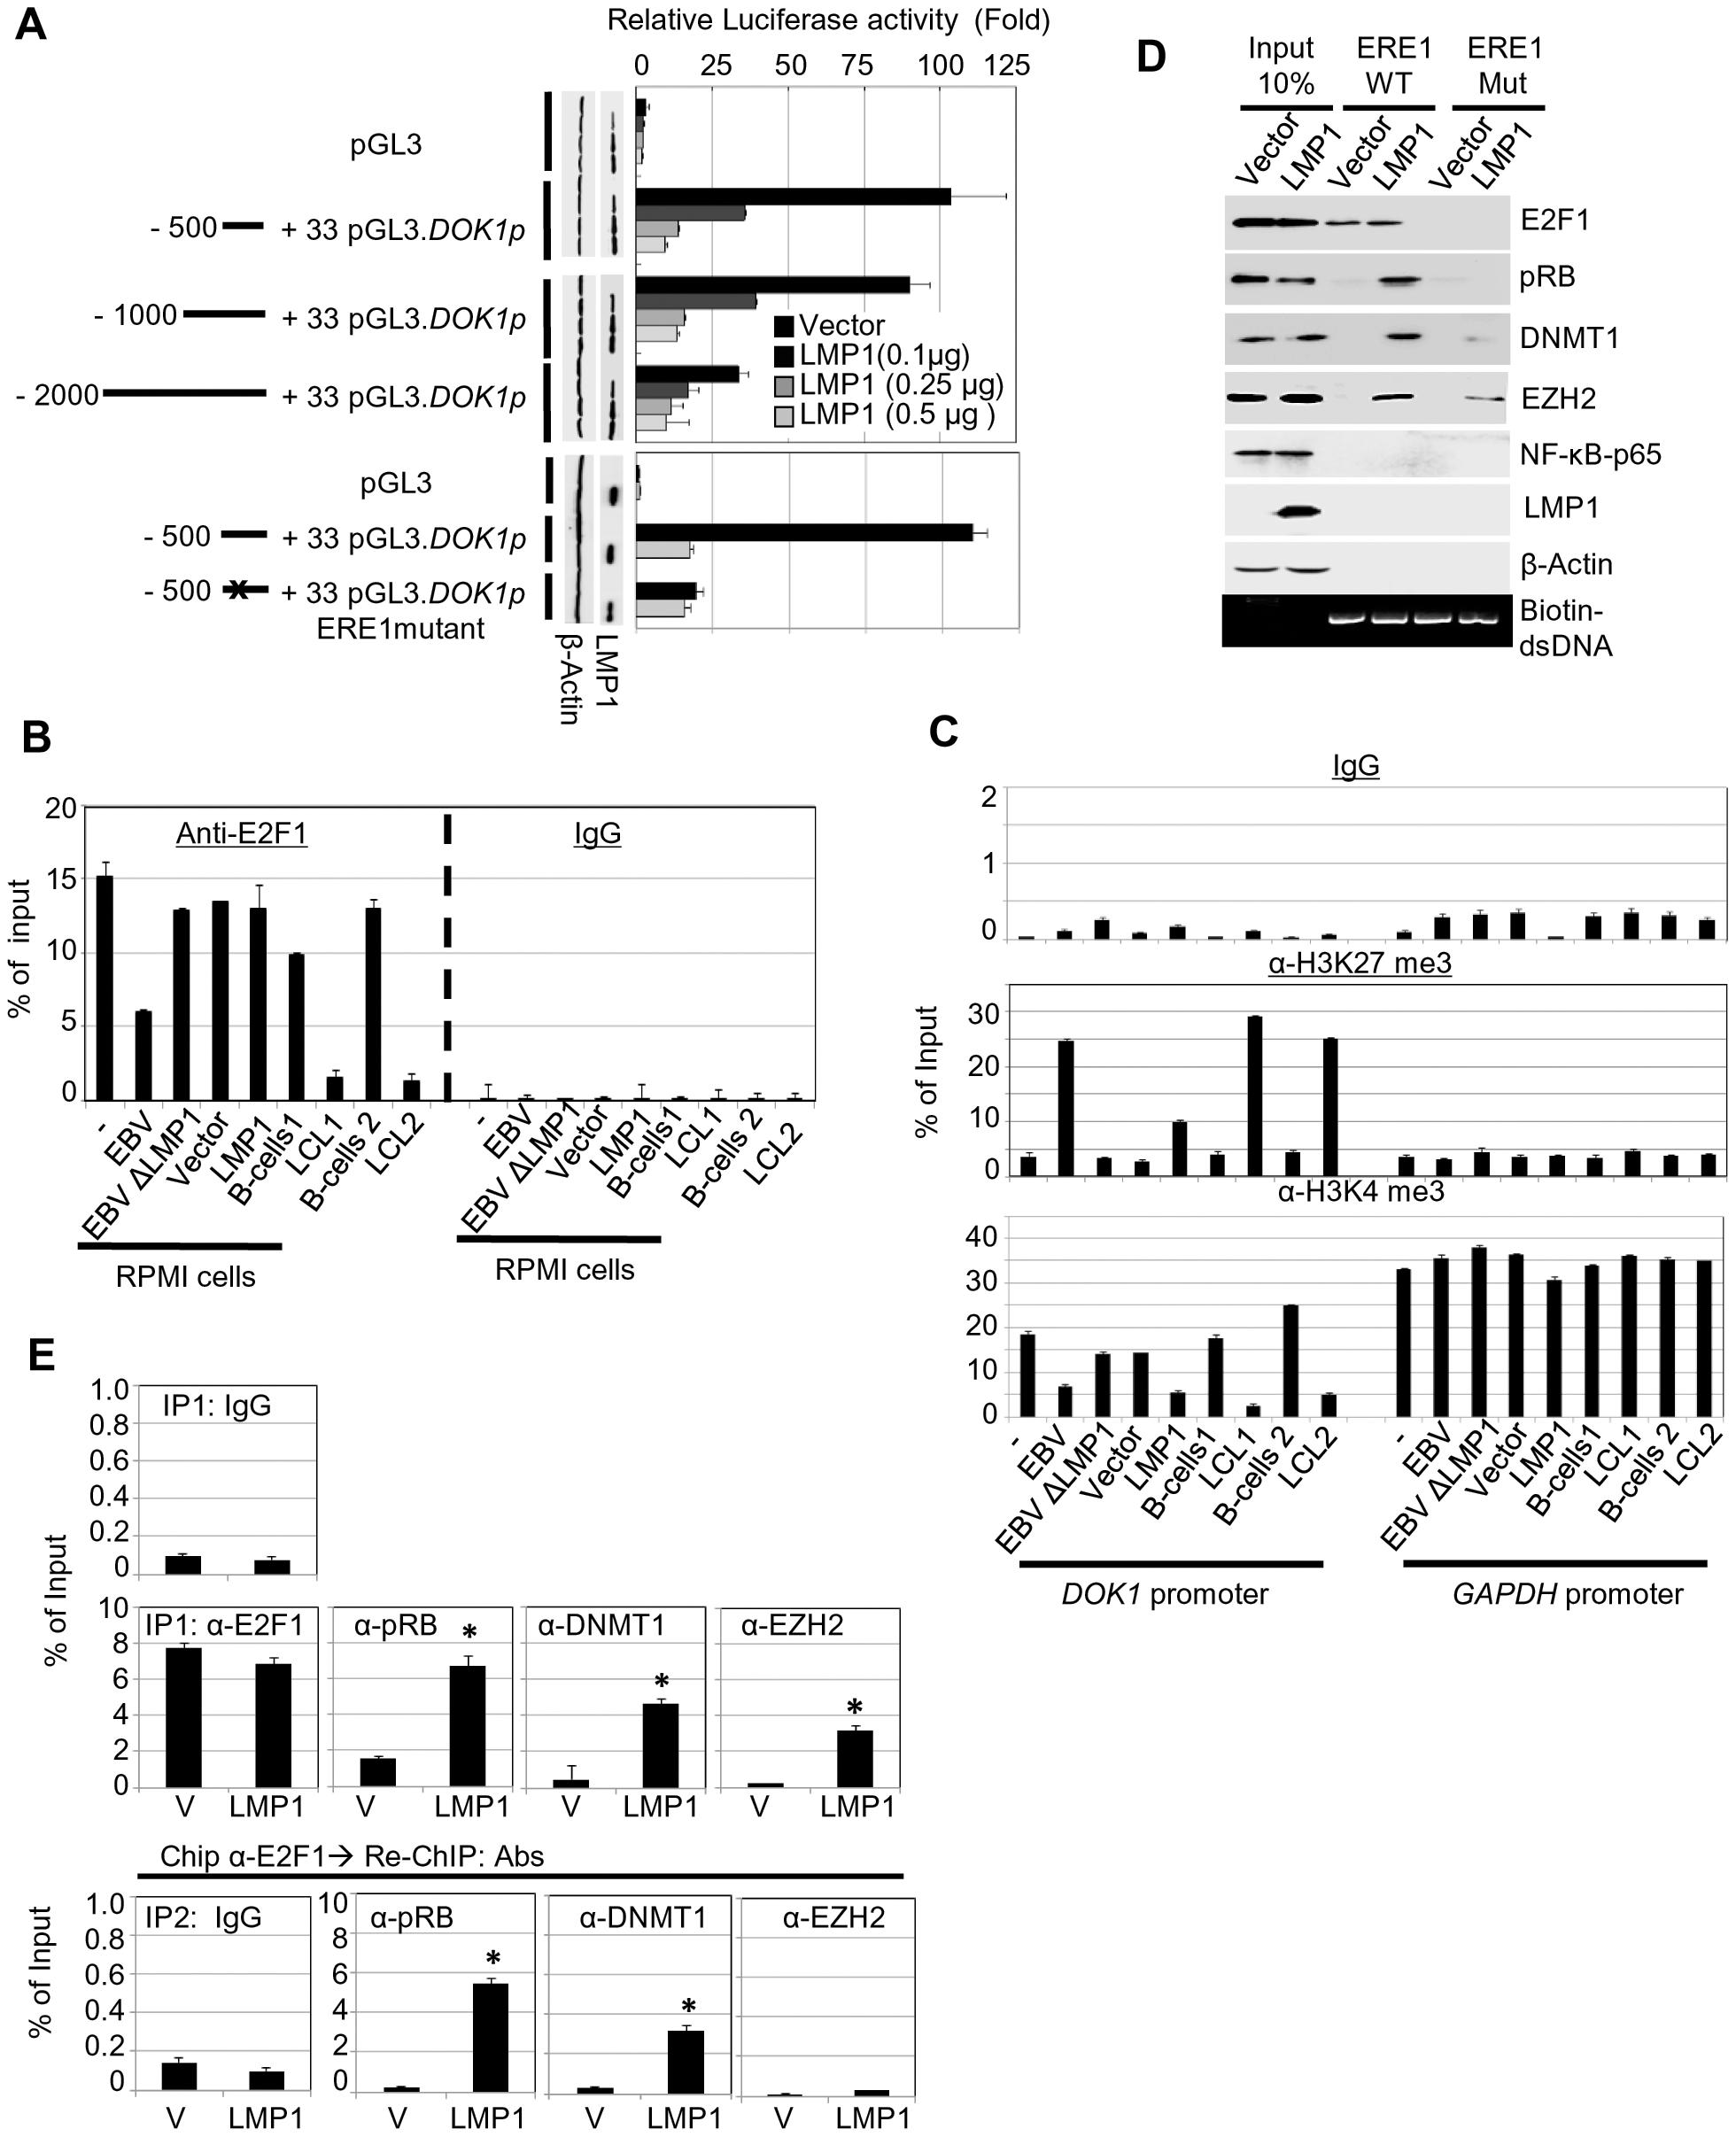 LMP1 represses <i>DOK1</i> promoter activity through the recruitment of E2F1/pRB/DNMT1 inhibitory complex.